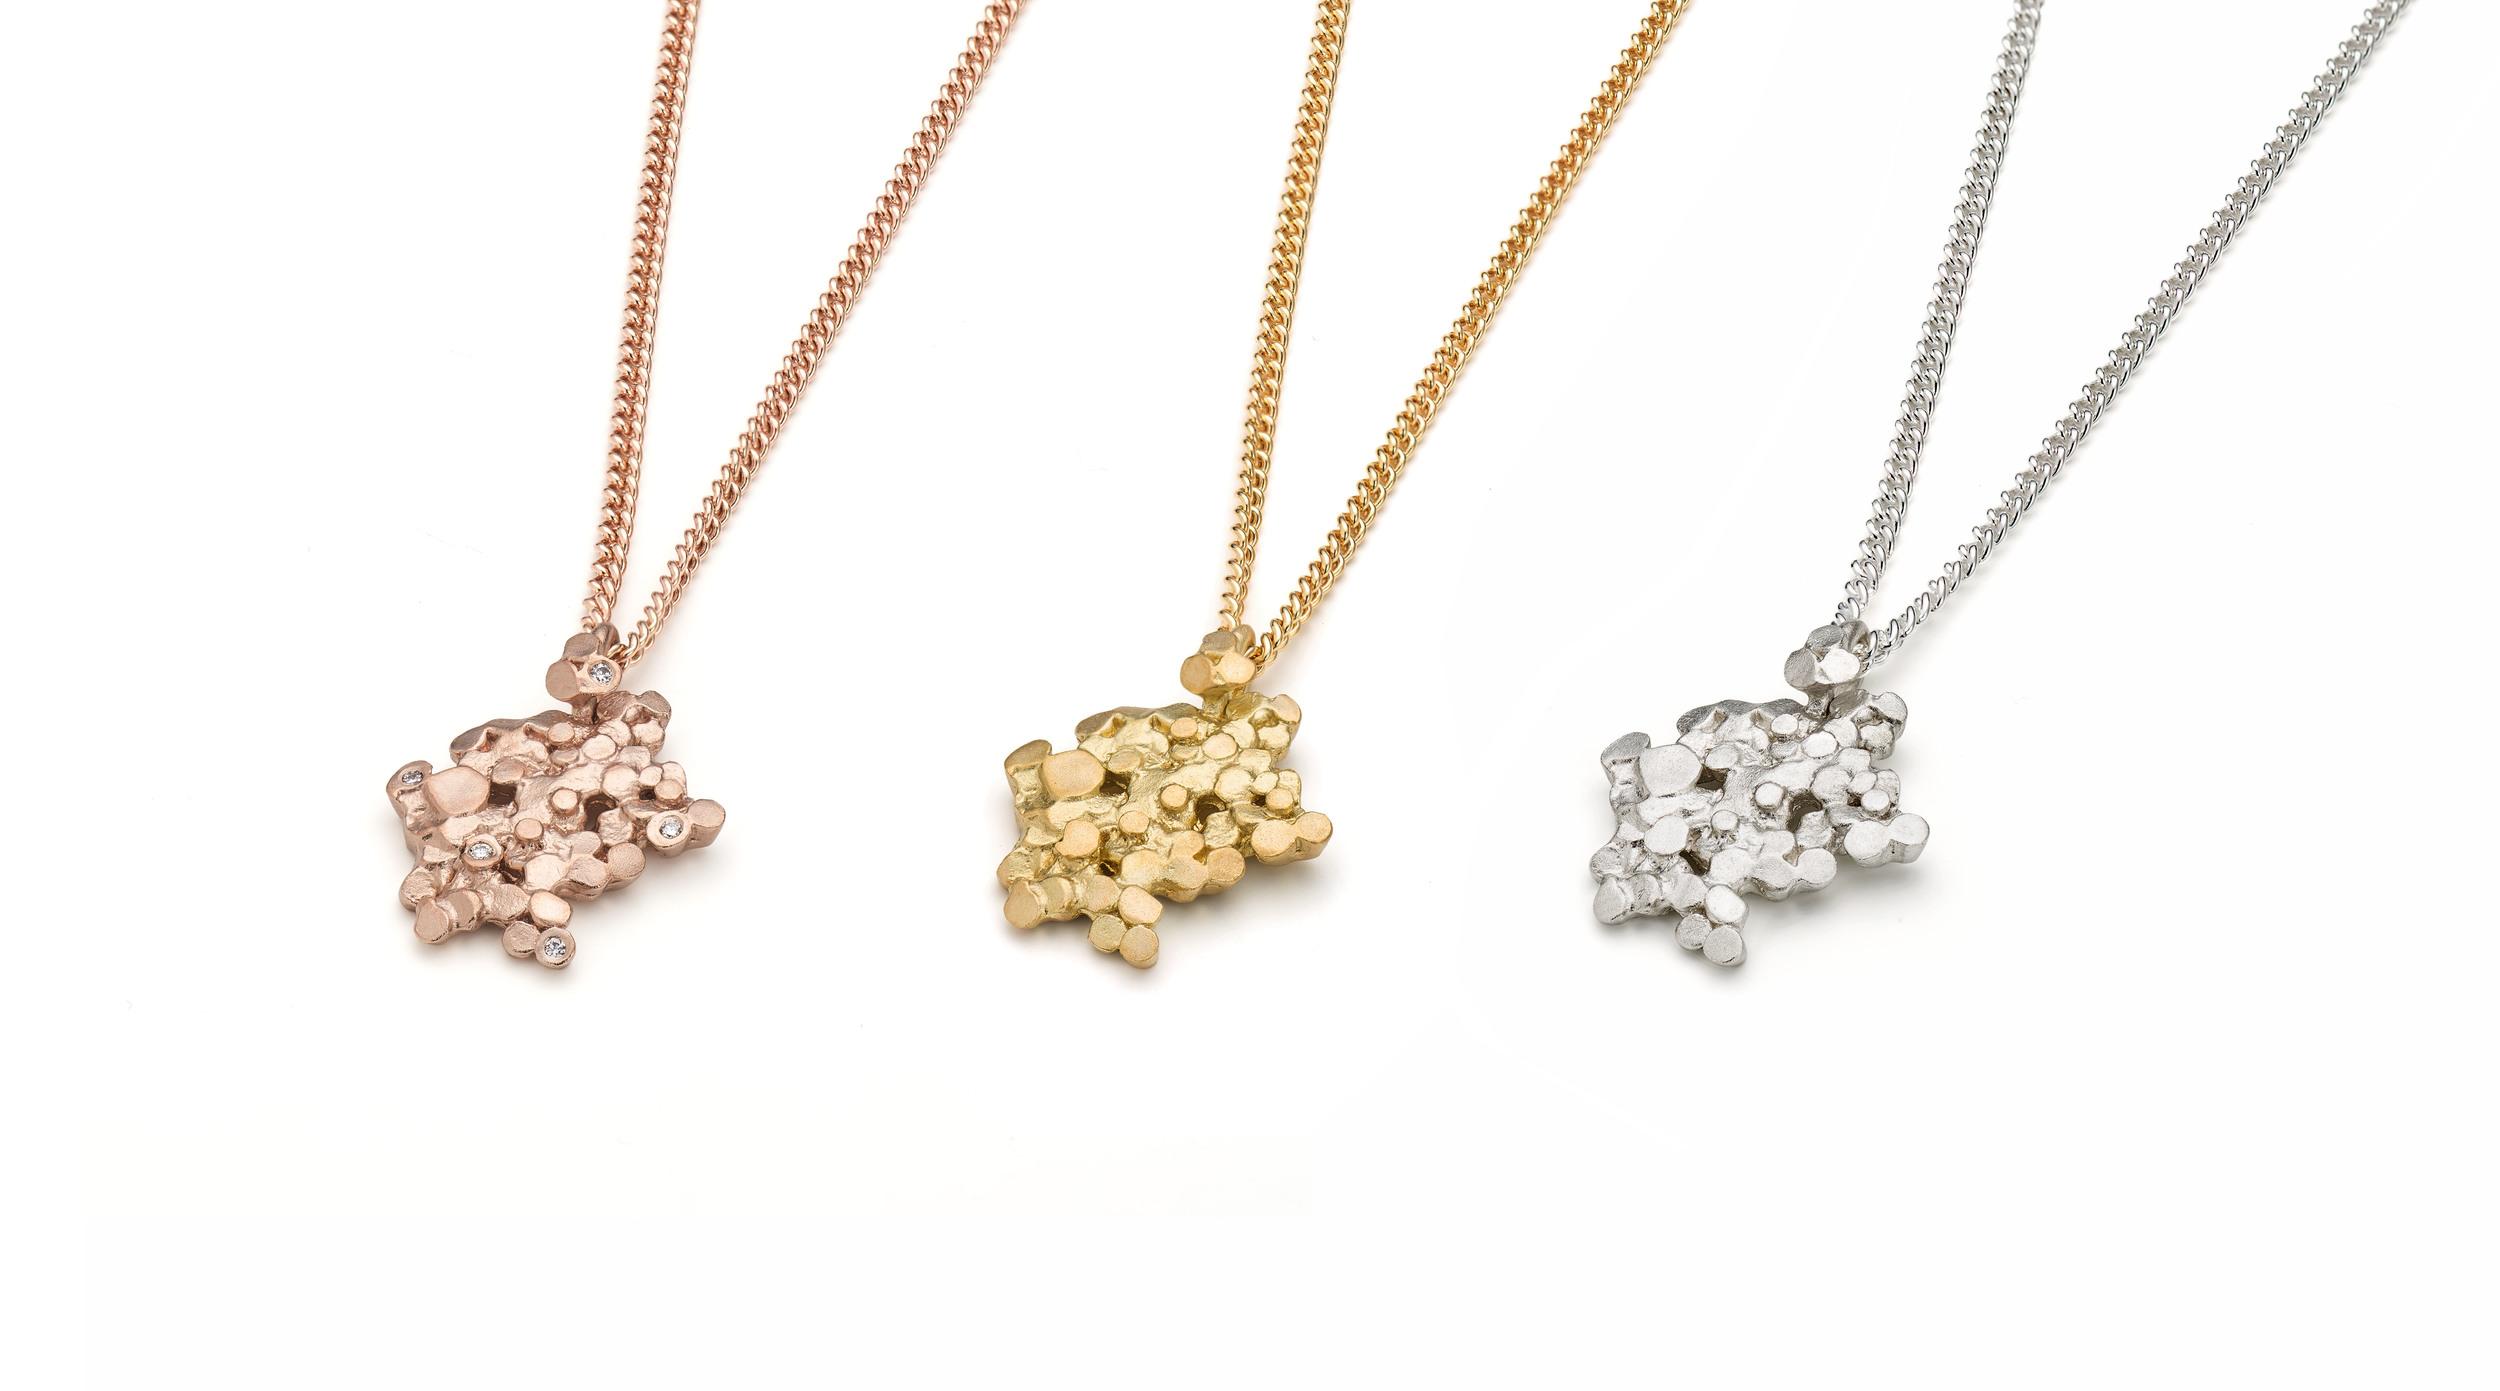 mirri damer Crown pendants.jpg